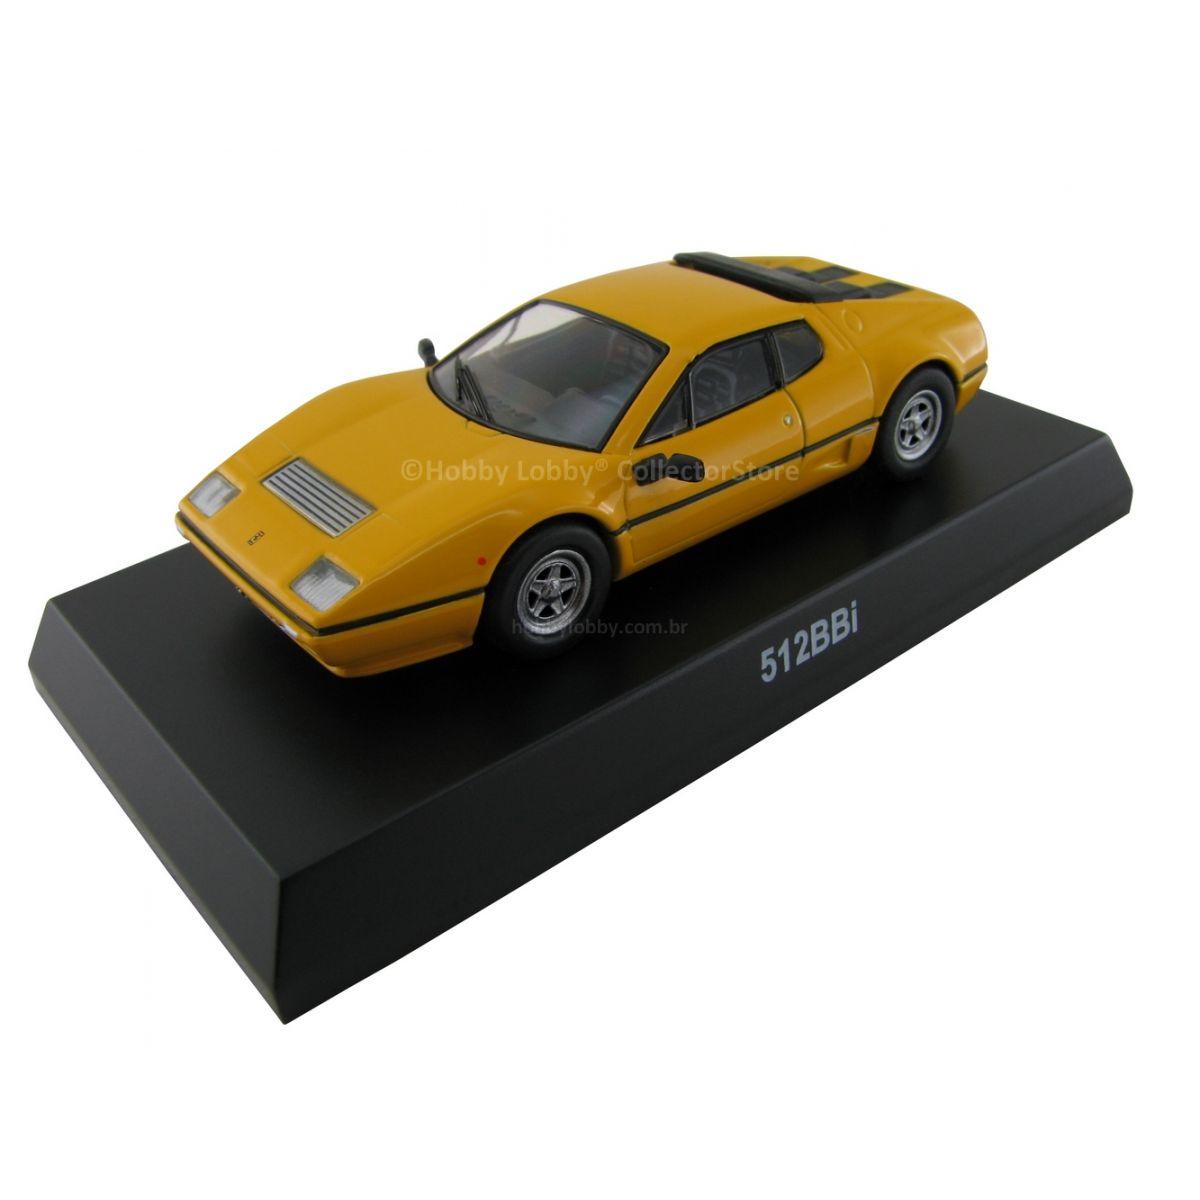 Kyosho - Ferrari Minicar Collection VI - Ferrari 512 BBi [amarela]